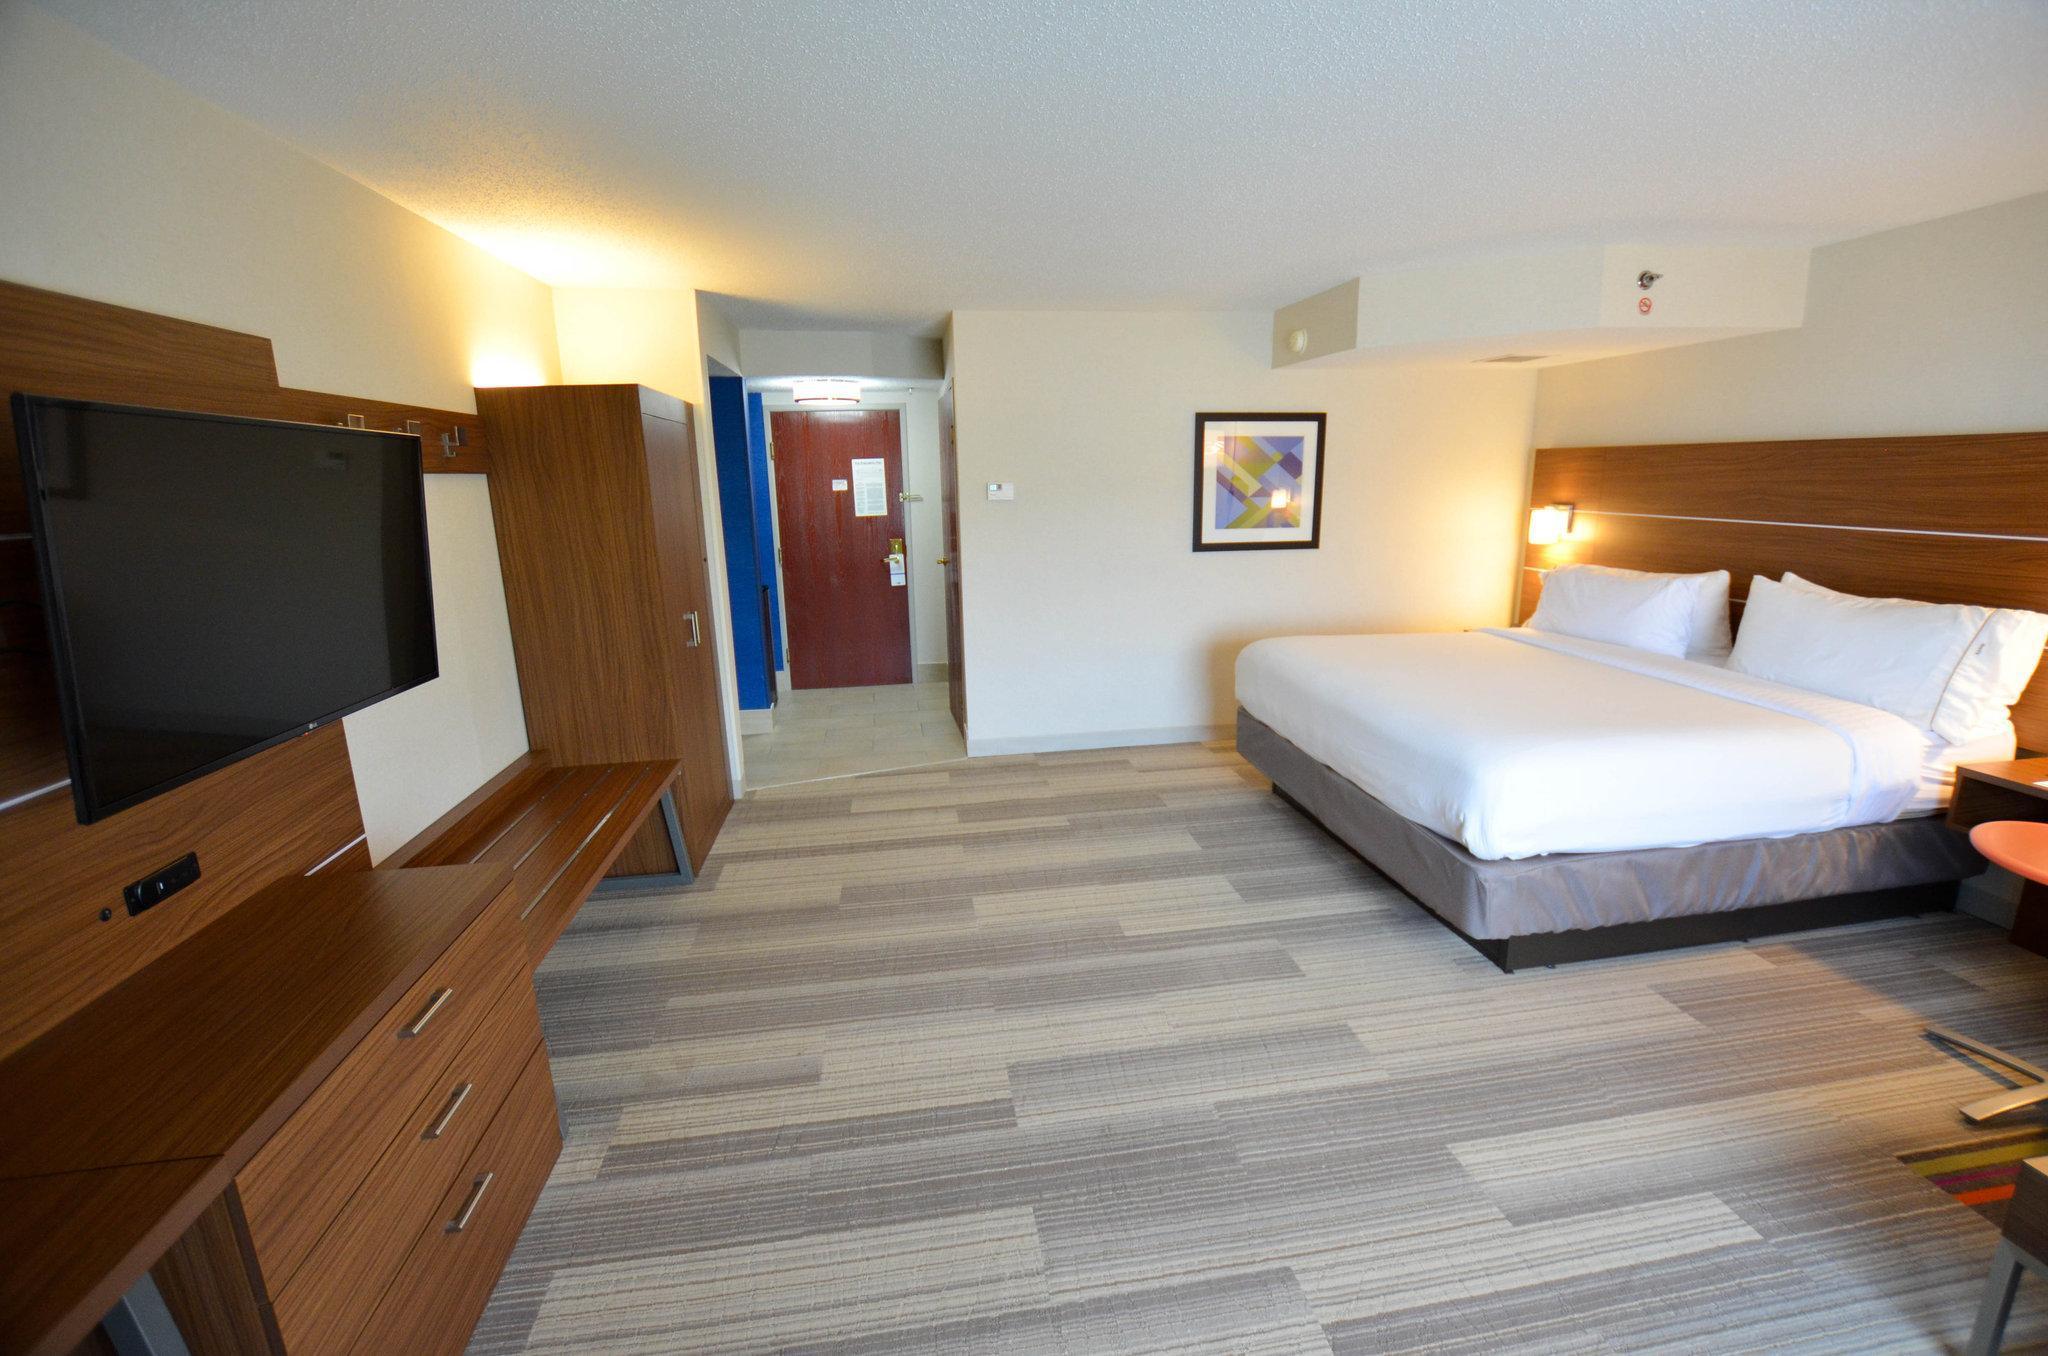 Holiday Inn Express Pittsburgh-Bridgeville, Allegheny